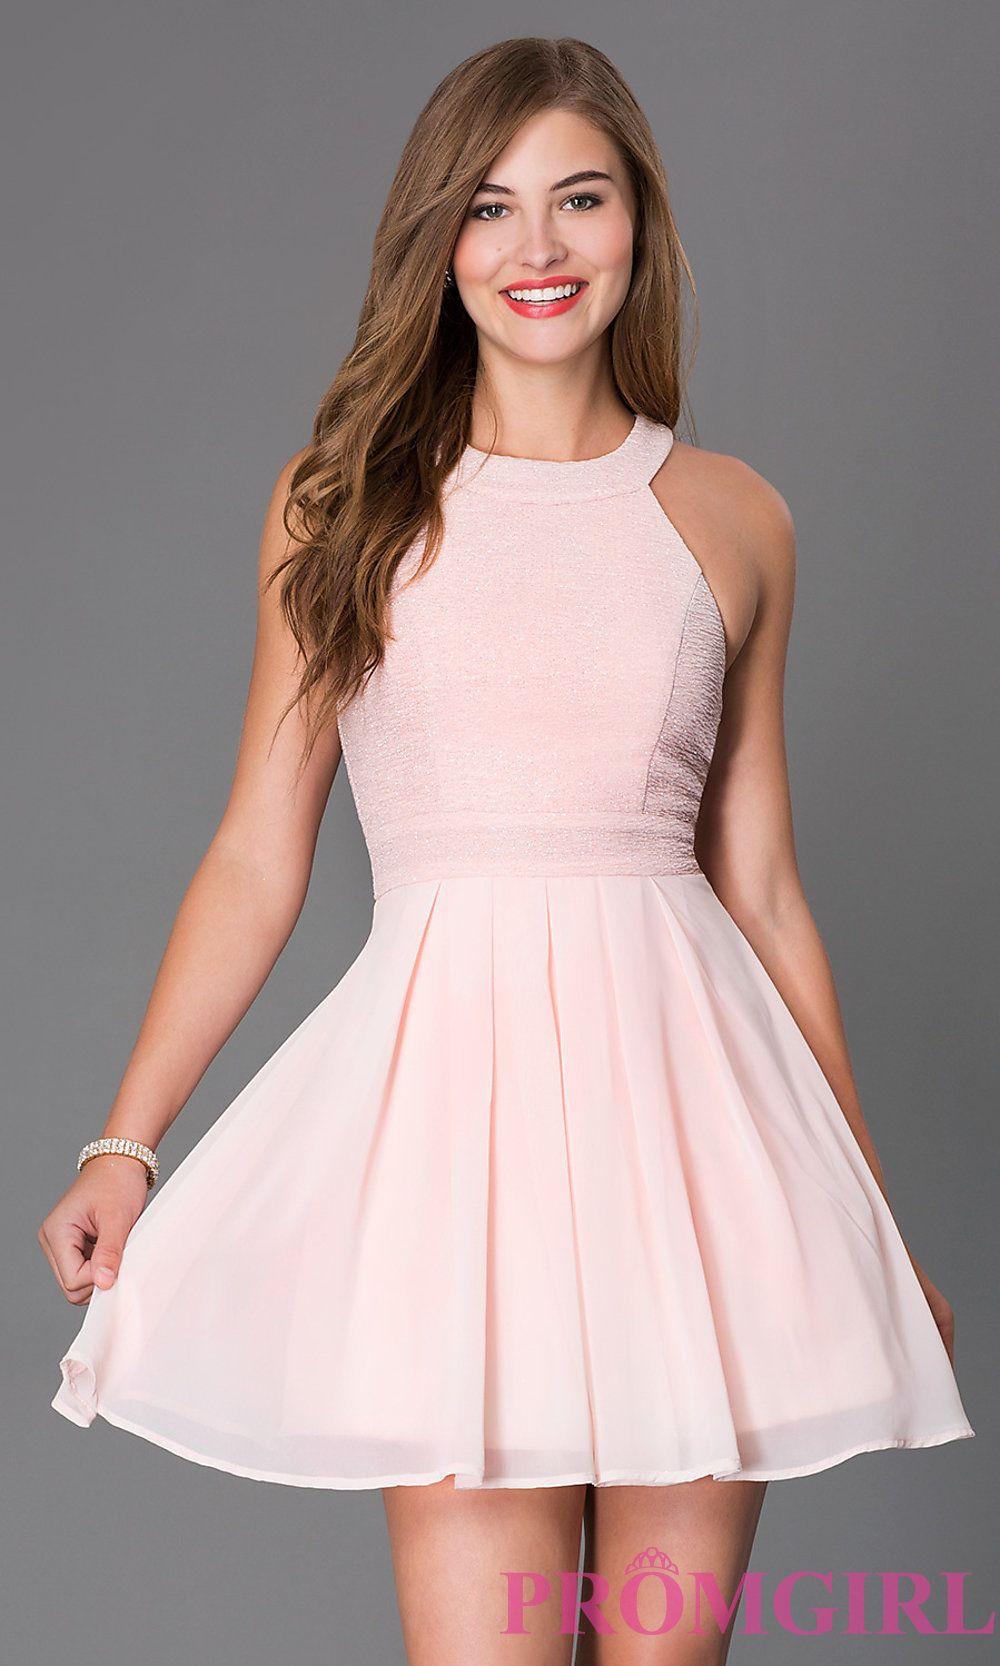 Wedding Prom Short Dresses pink short sleeveless fit and flare party dress bat mitzvah dress